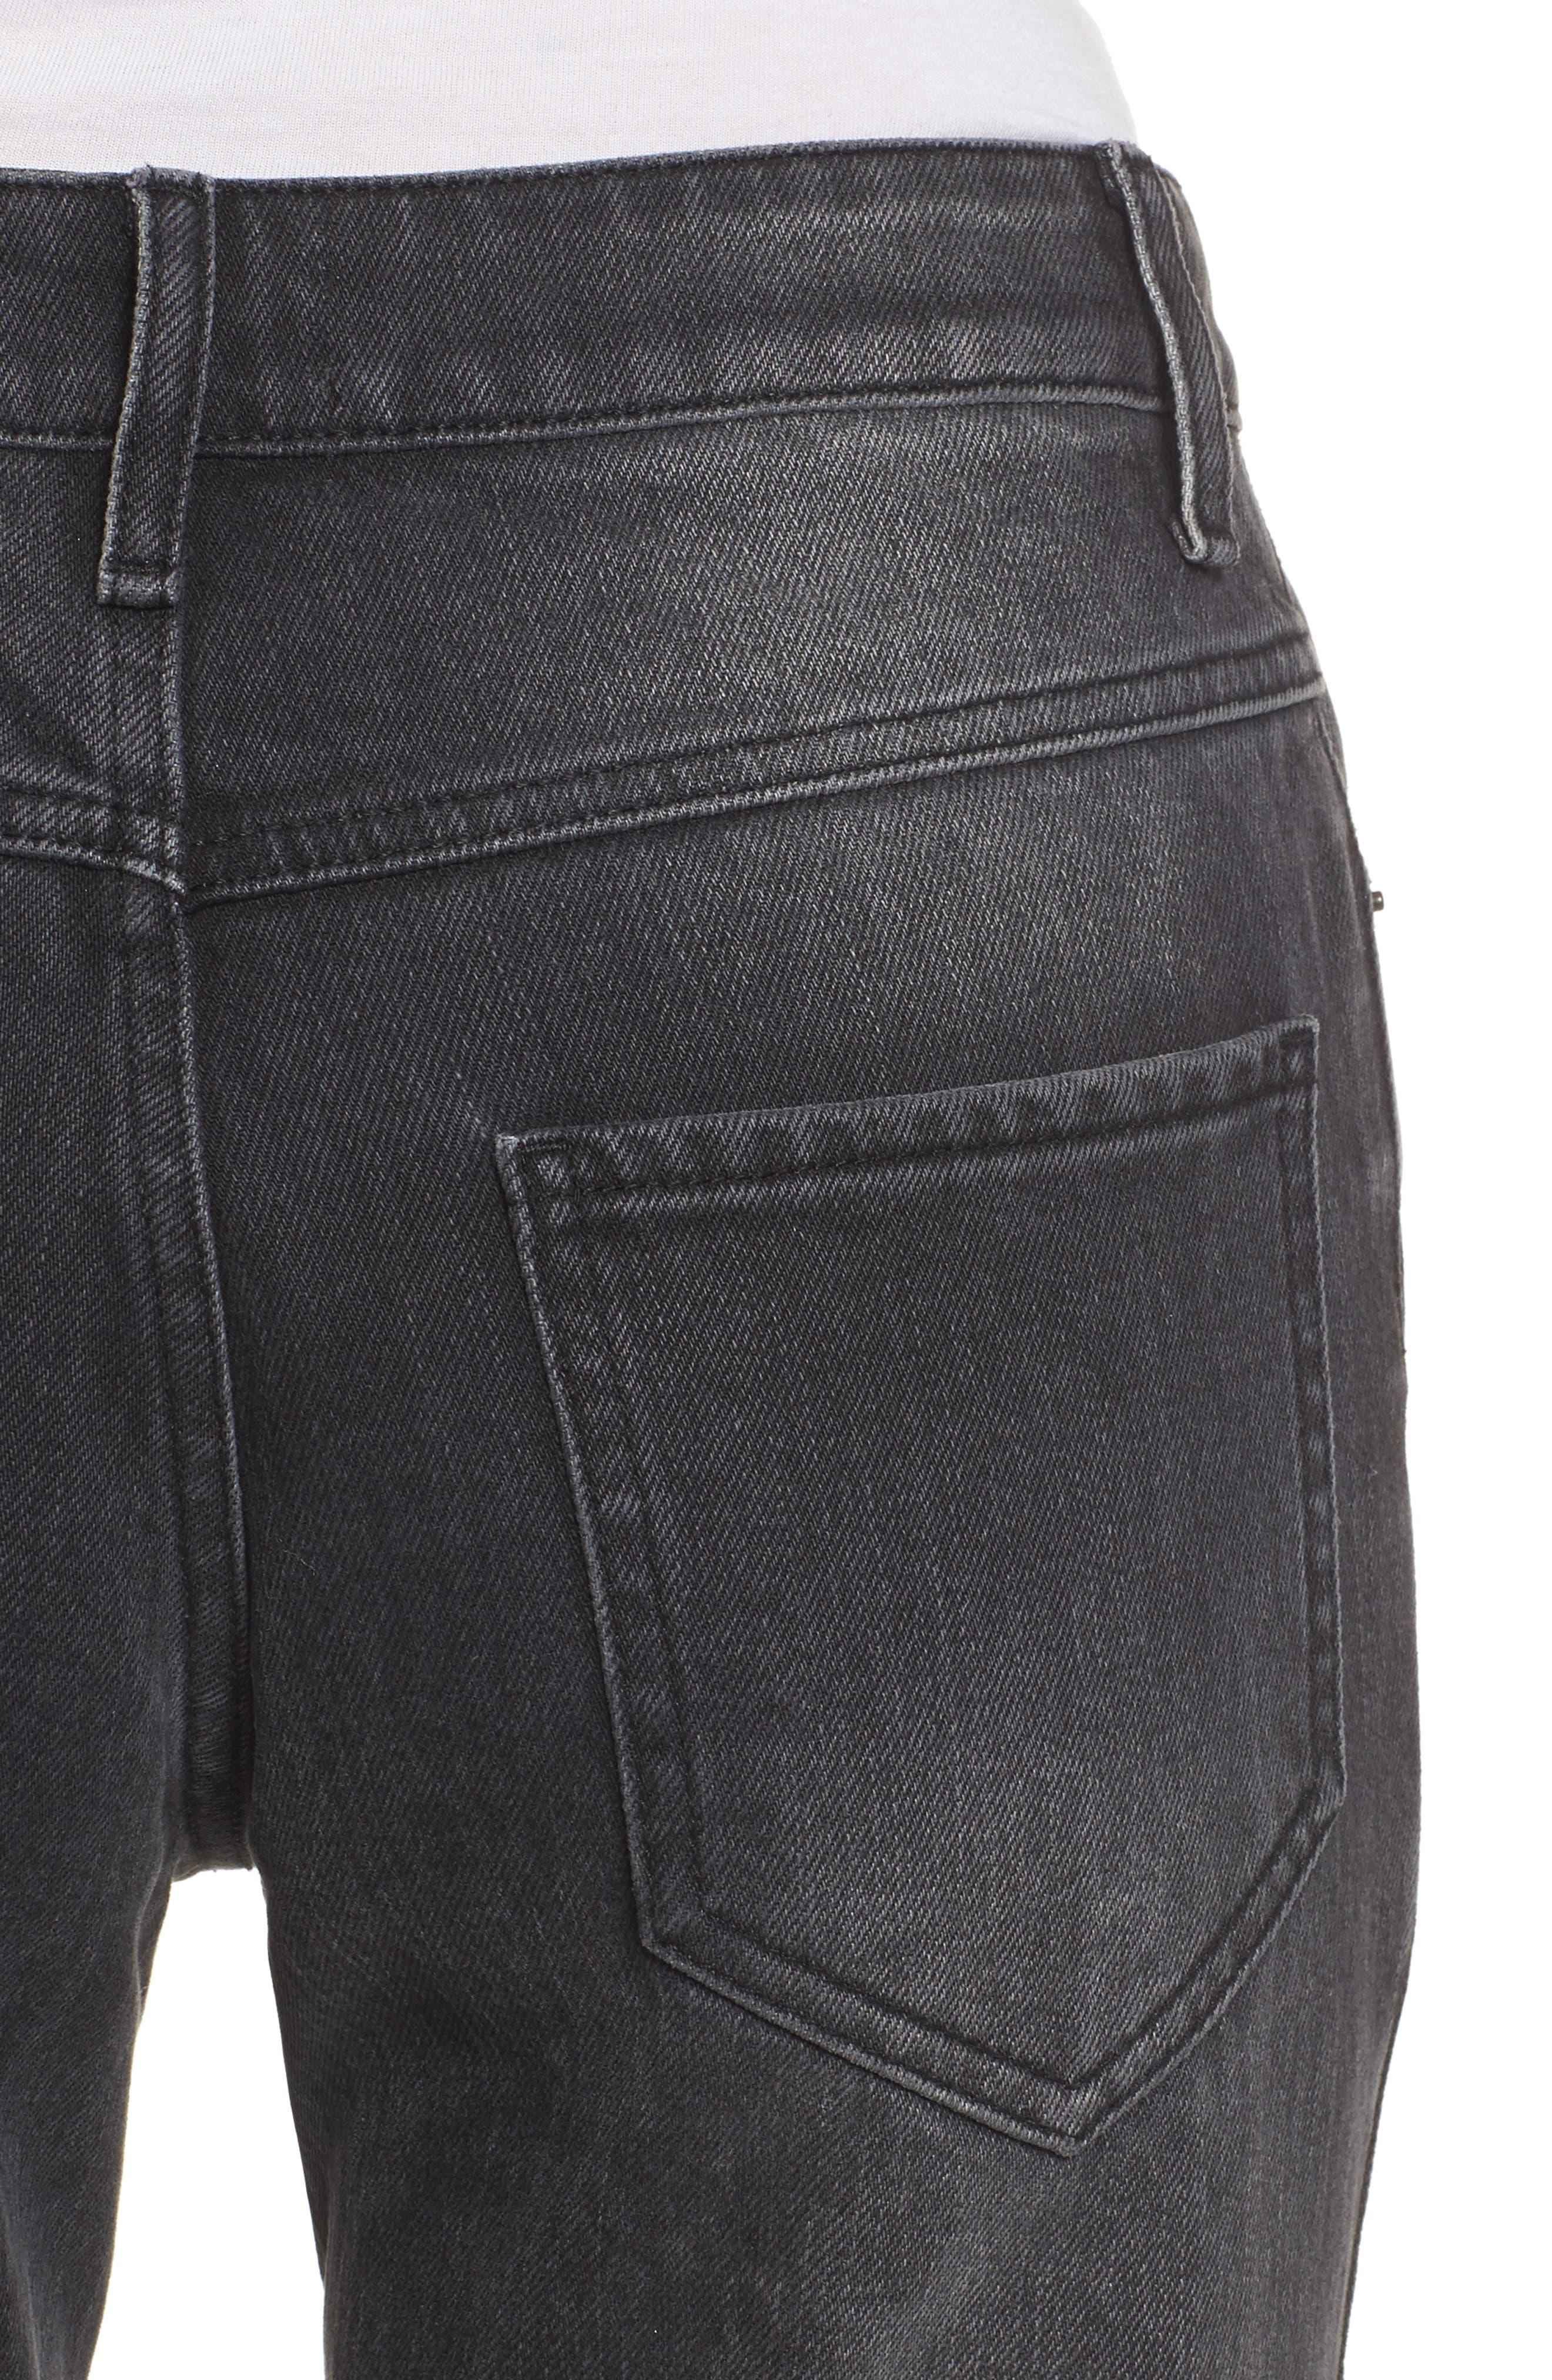 Alternate Image 4  - Sincerely Jules High Waist Crop Flare Jeans (Washed Black)